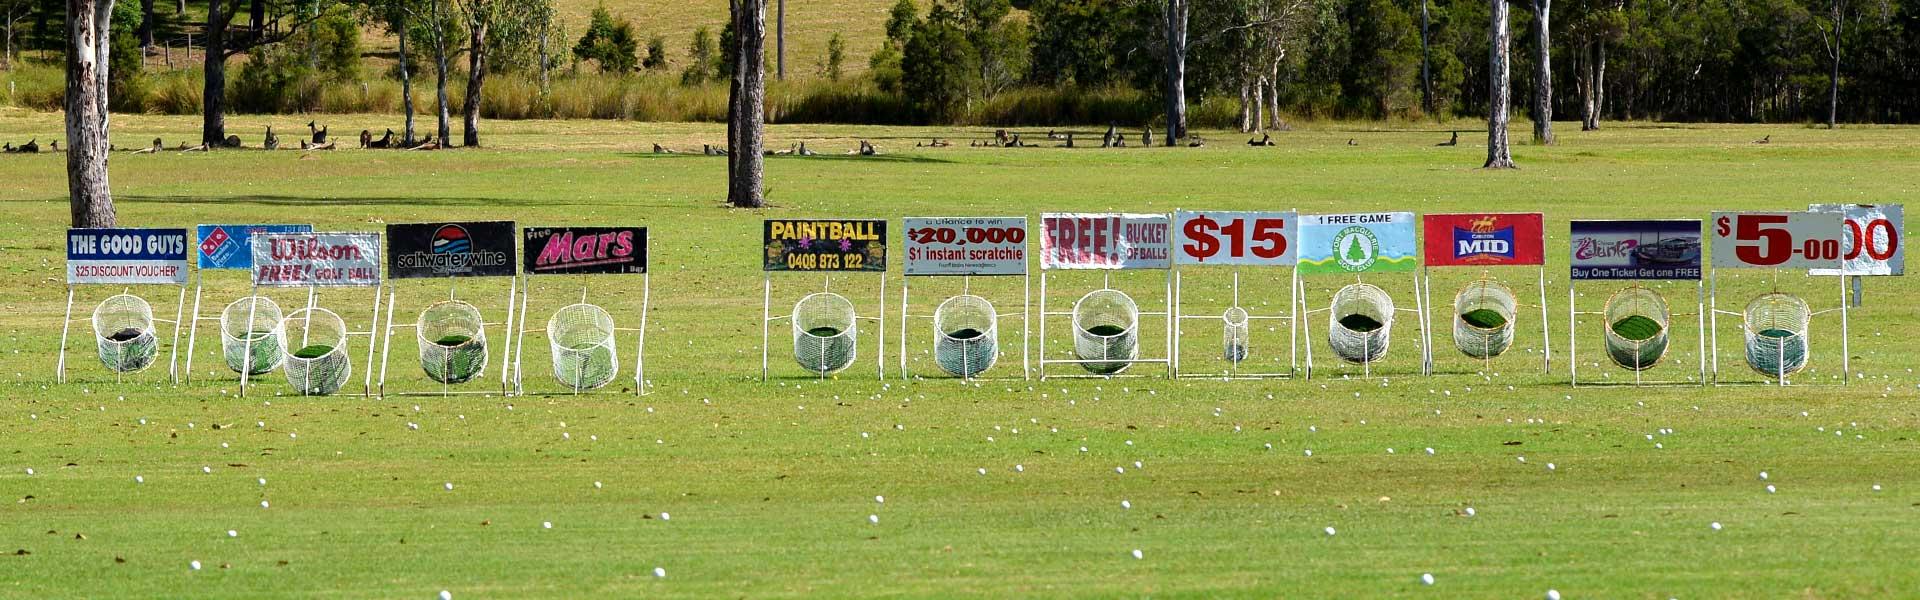 Port Macquarie Golf Driving Range Amp Mini Golf Putt Putt